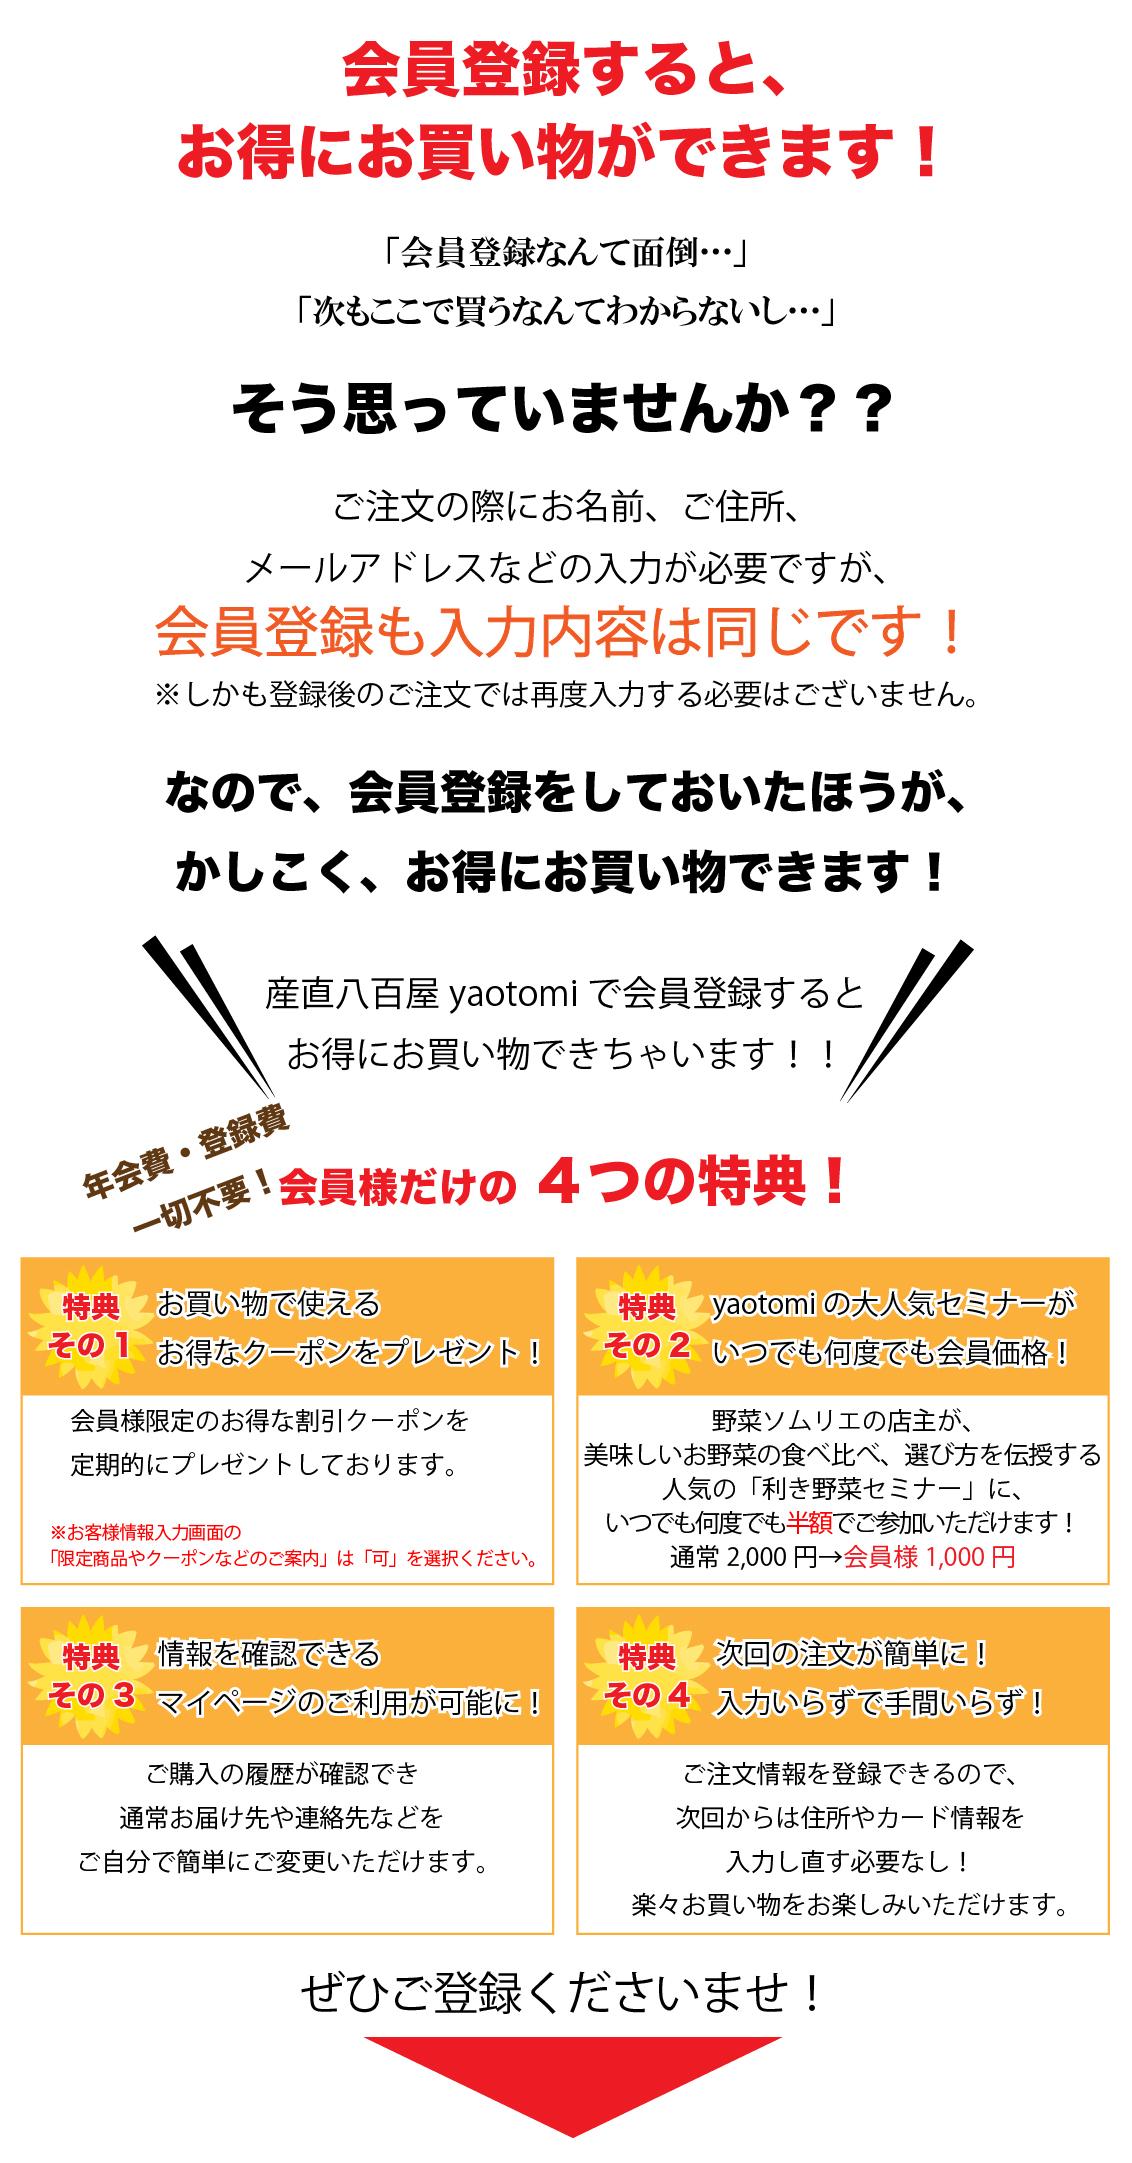 yaotomi 会員登録